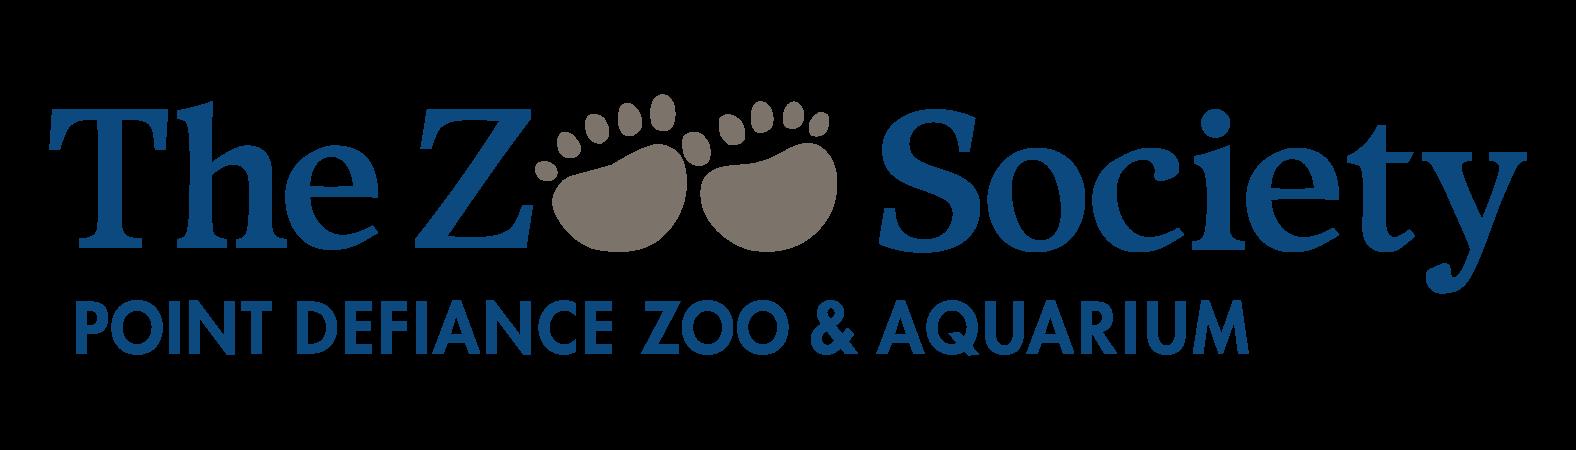 The Zoo Society: Point Defiance Zoo & Aquarium